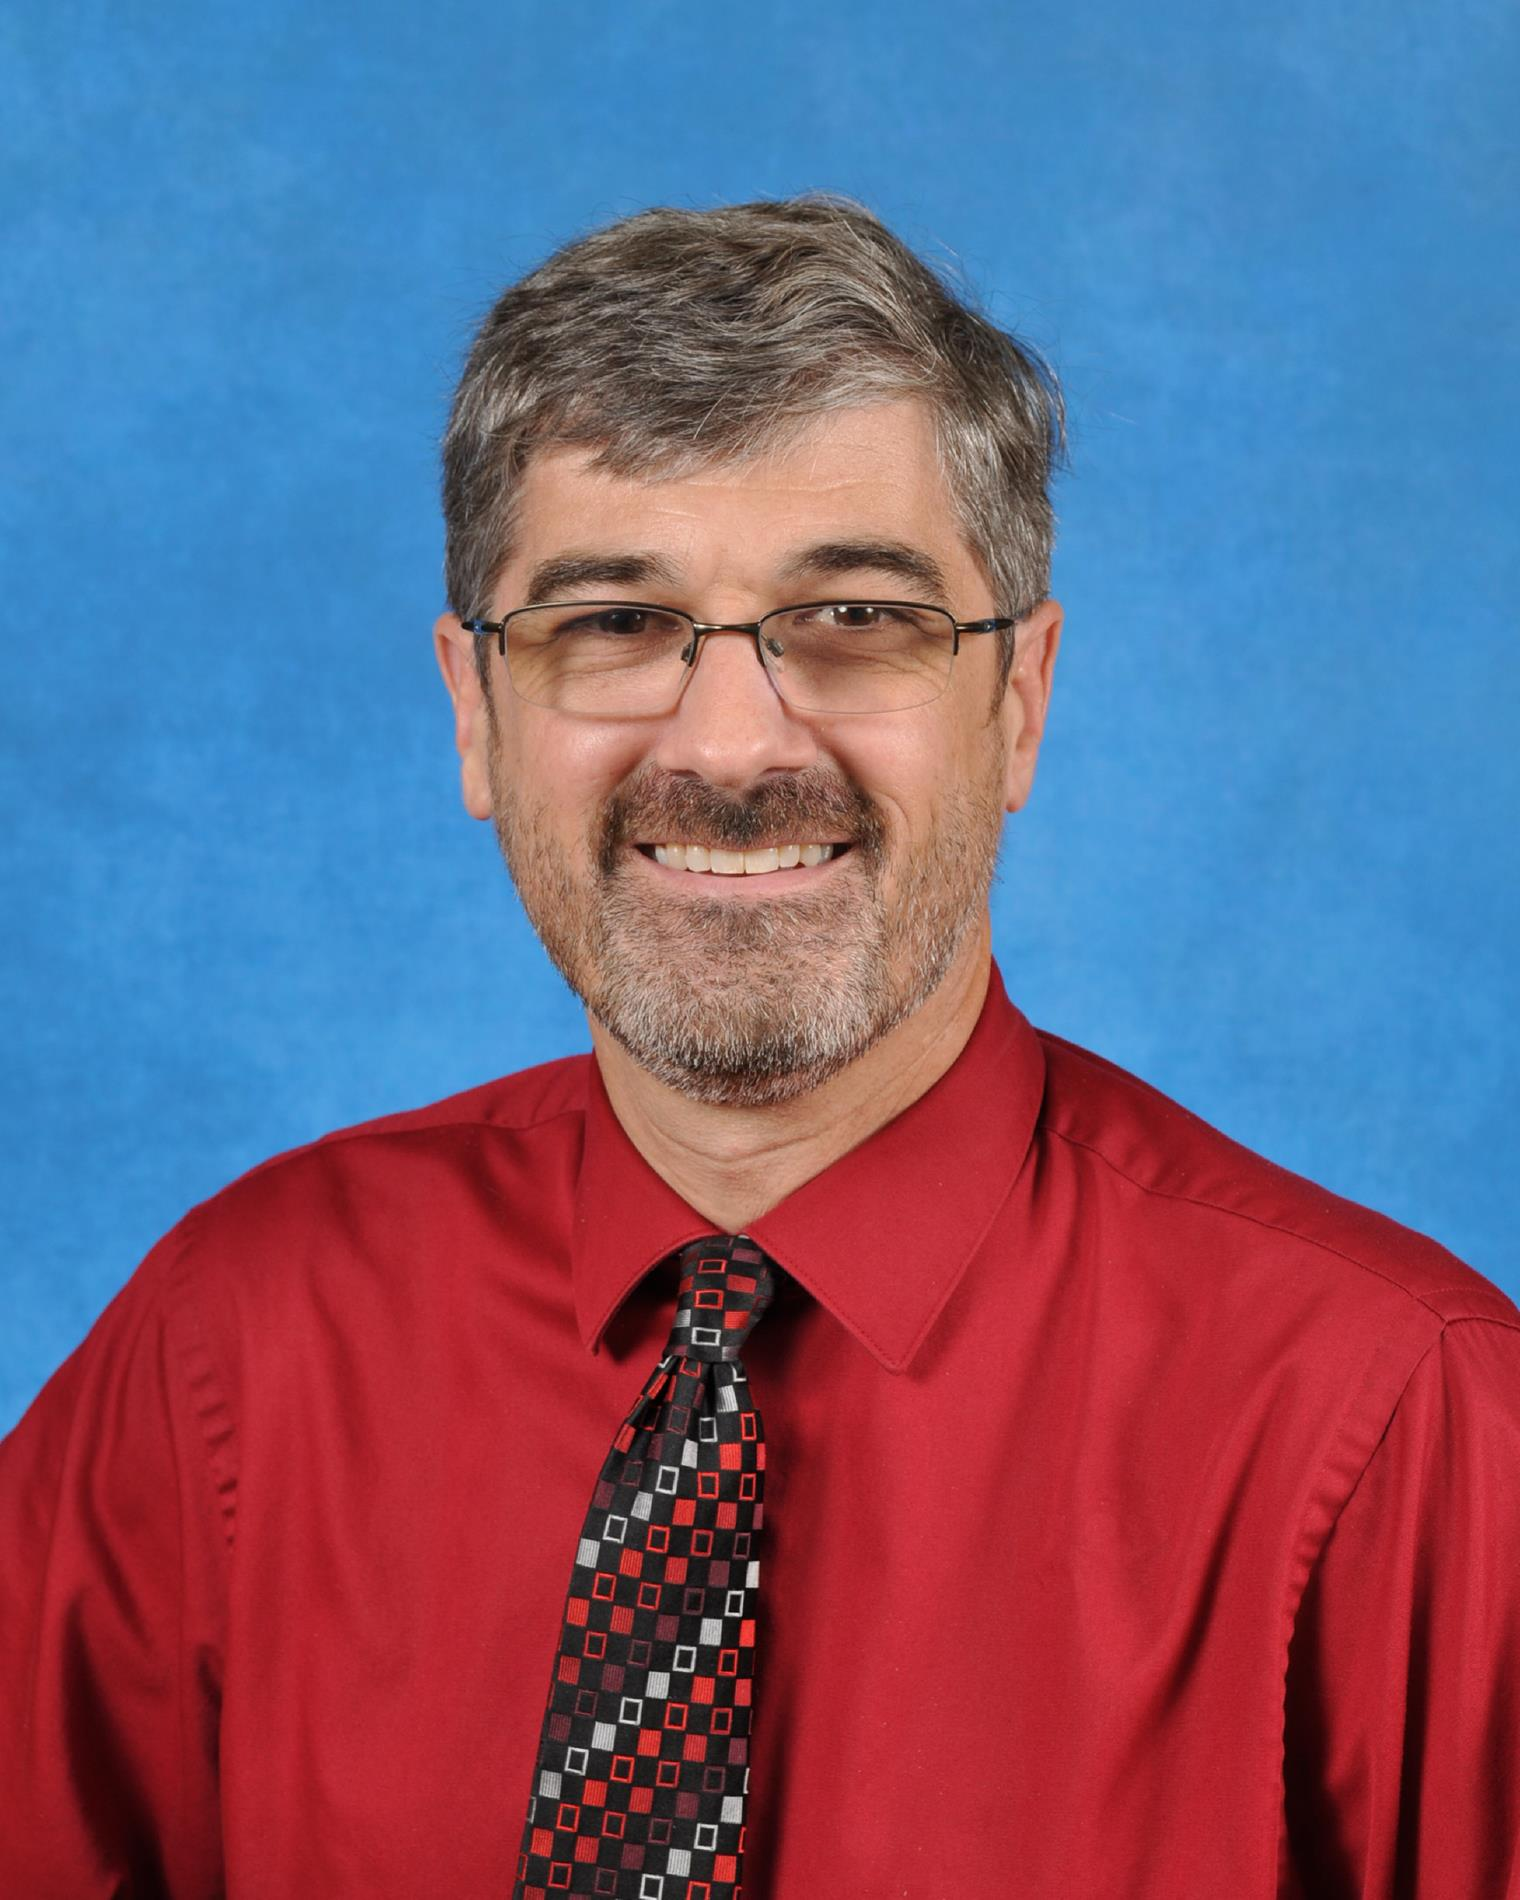 Dr. Andy Payne